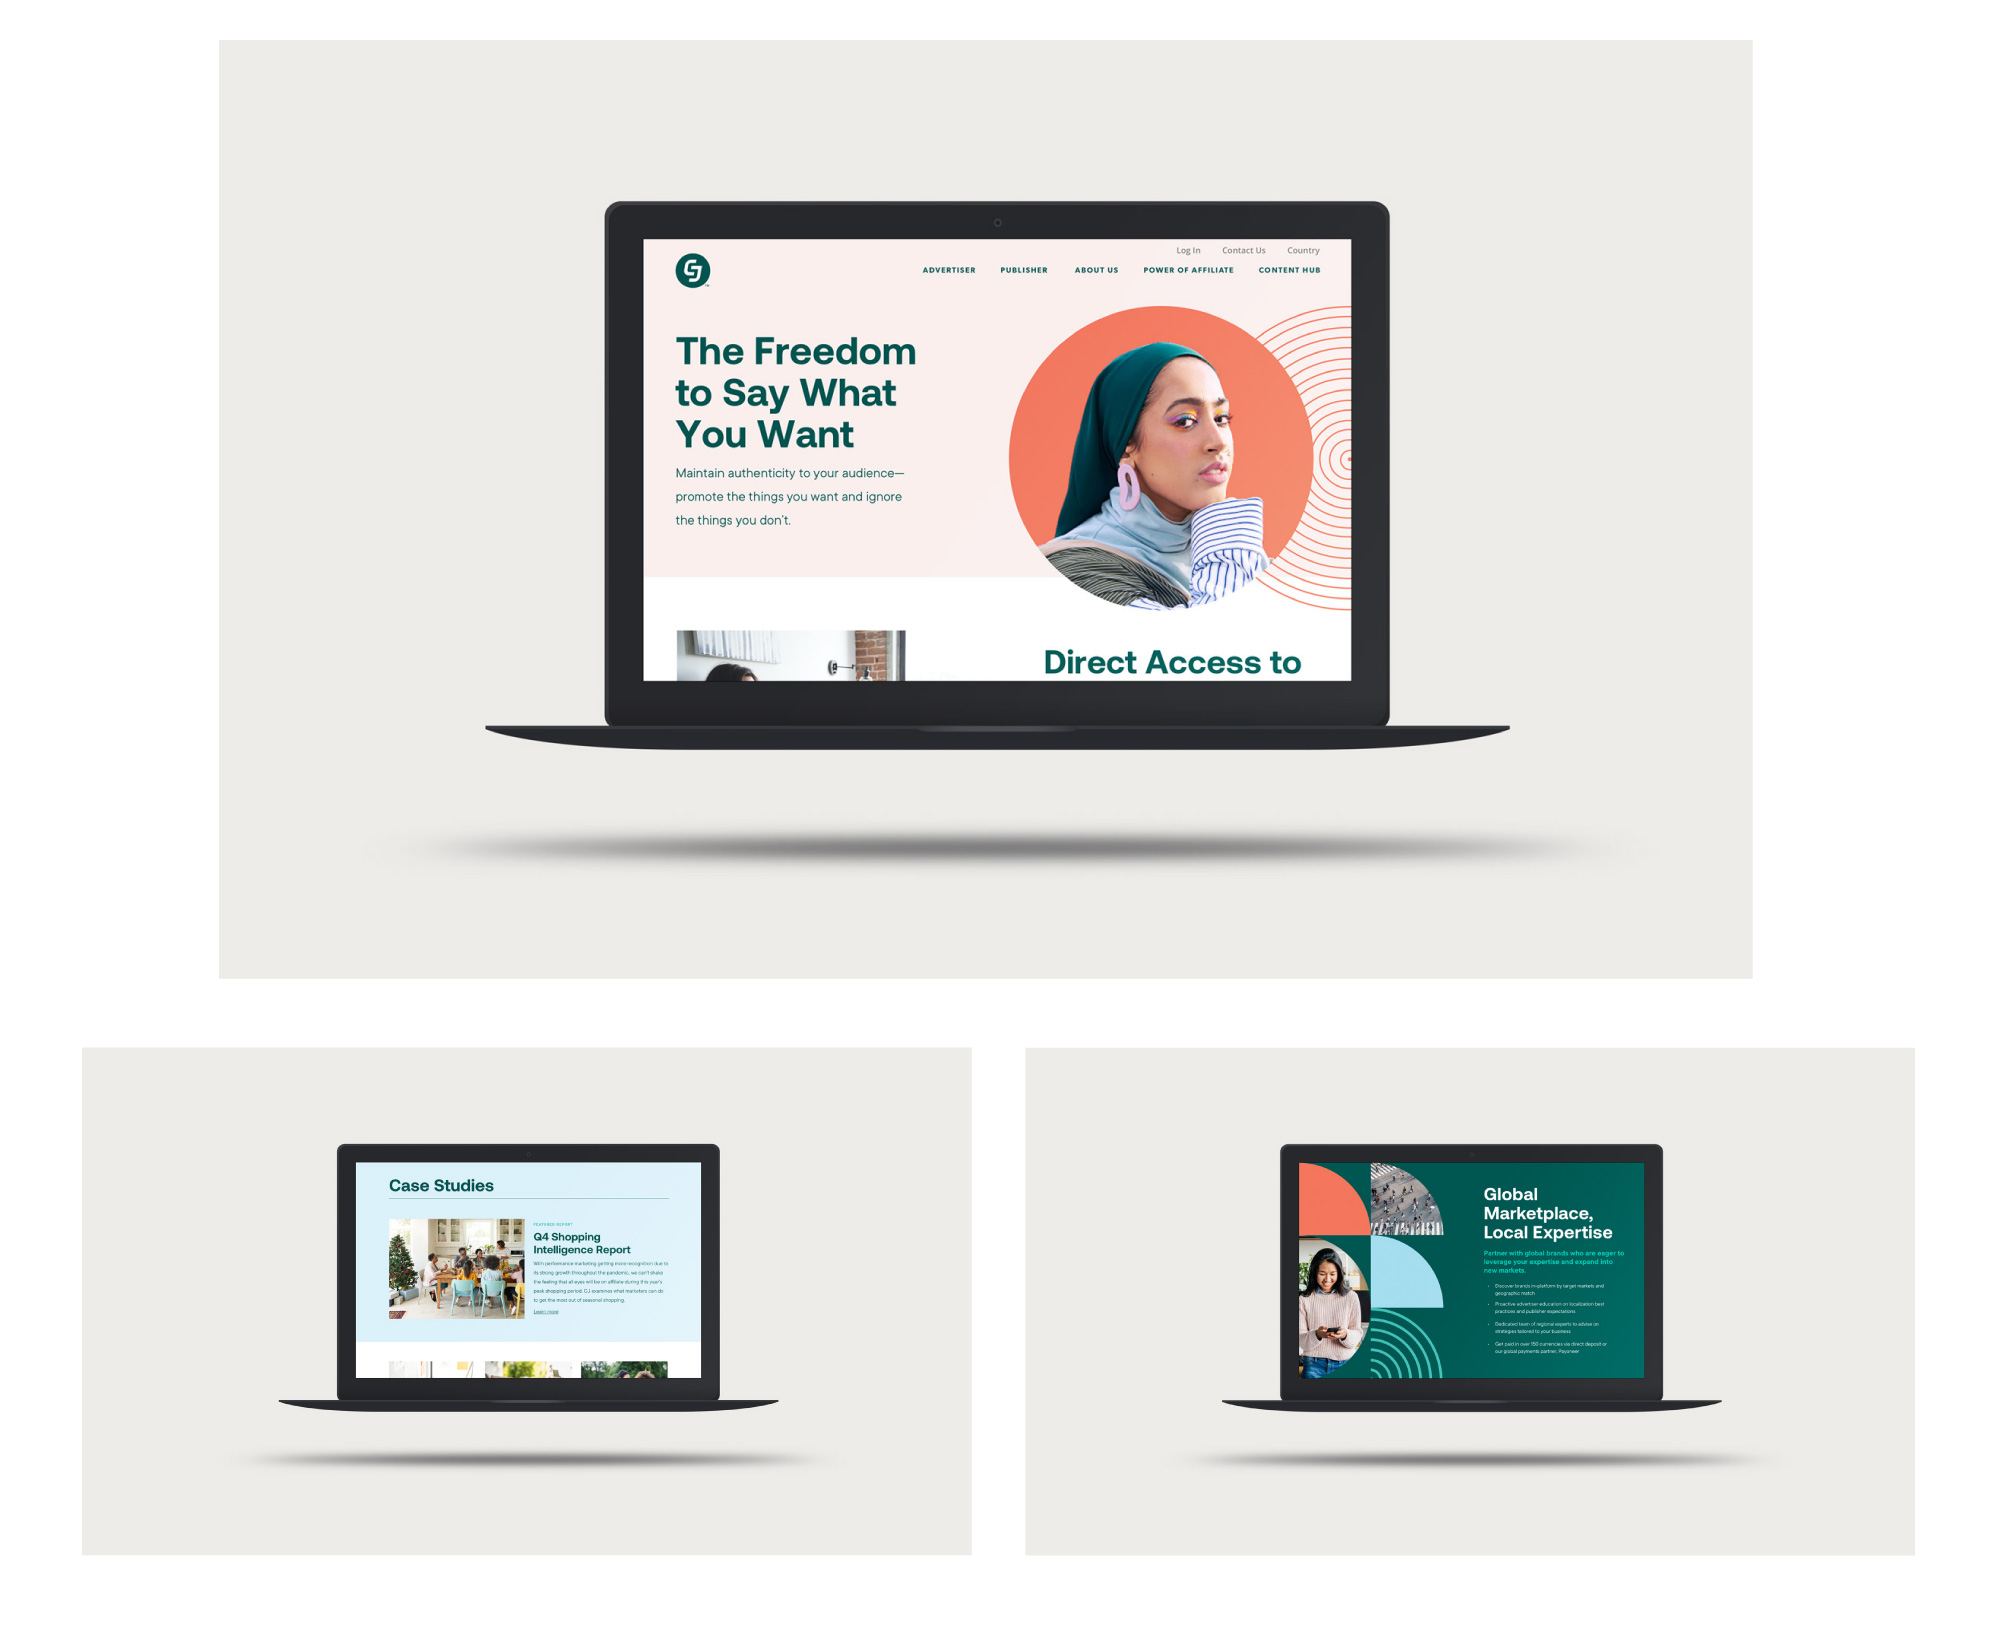 cj-affiliate-2021-brand-refresh-website-FINAL